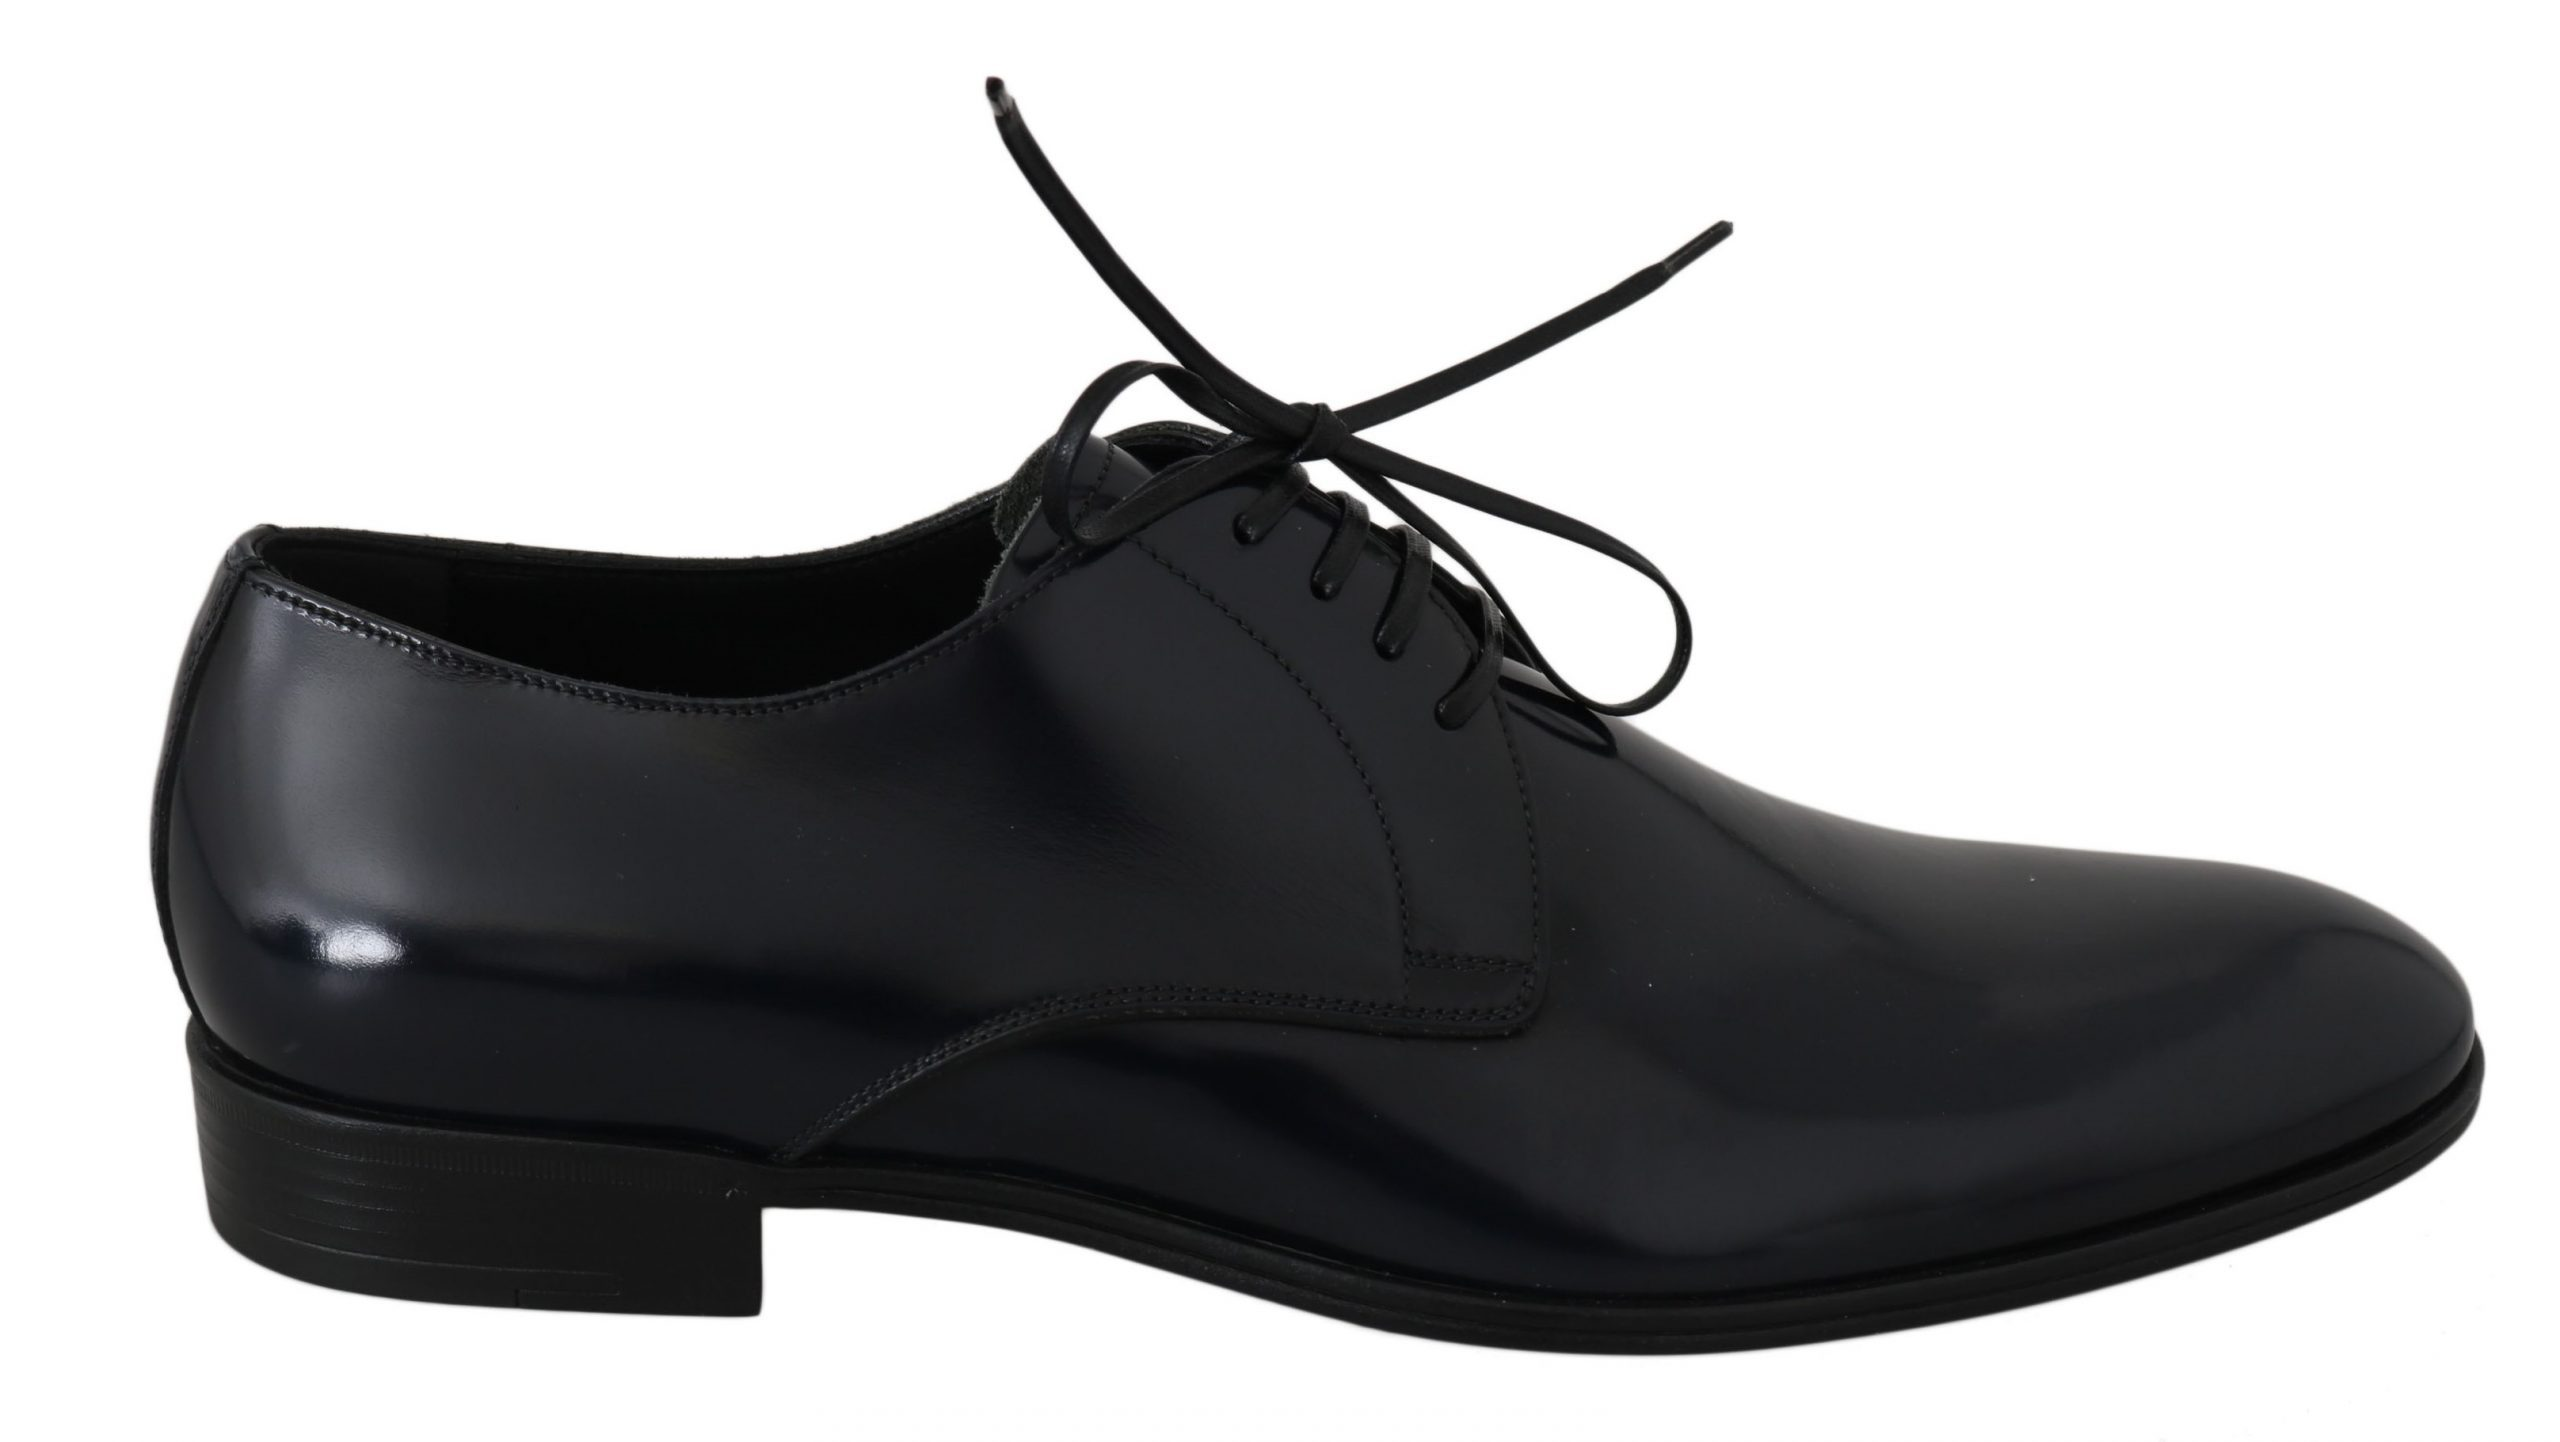 Dolce & Gabbana Men's Shoes Blue MV2336 - EU40/US7